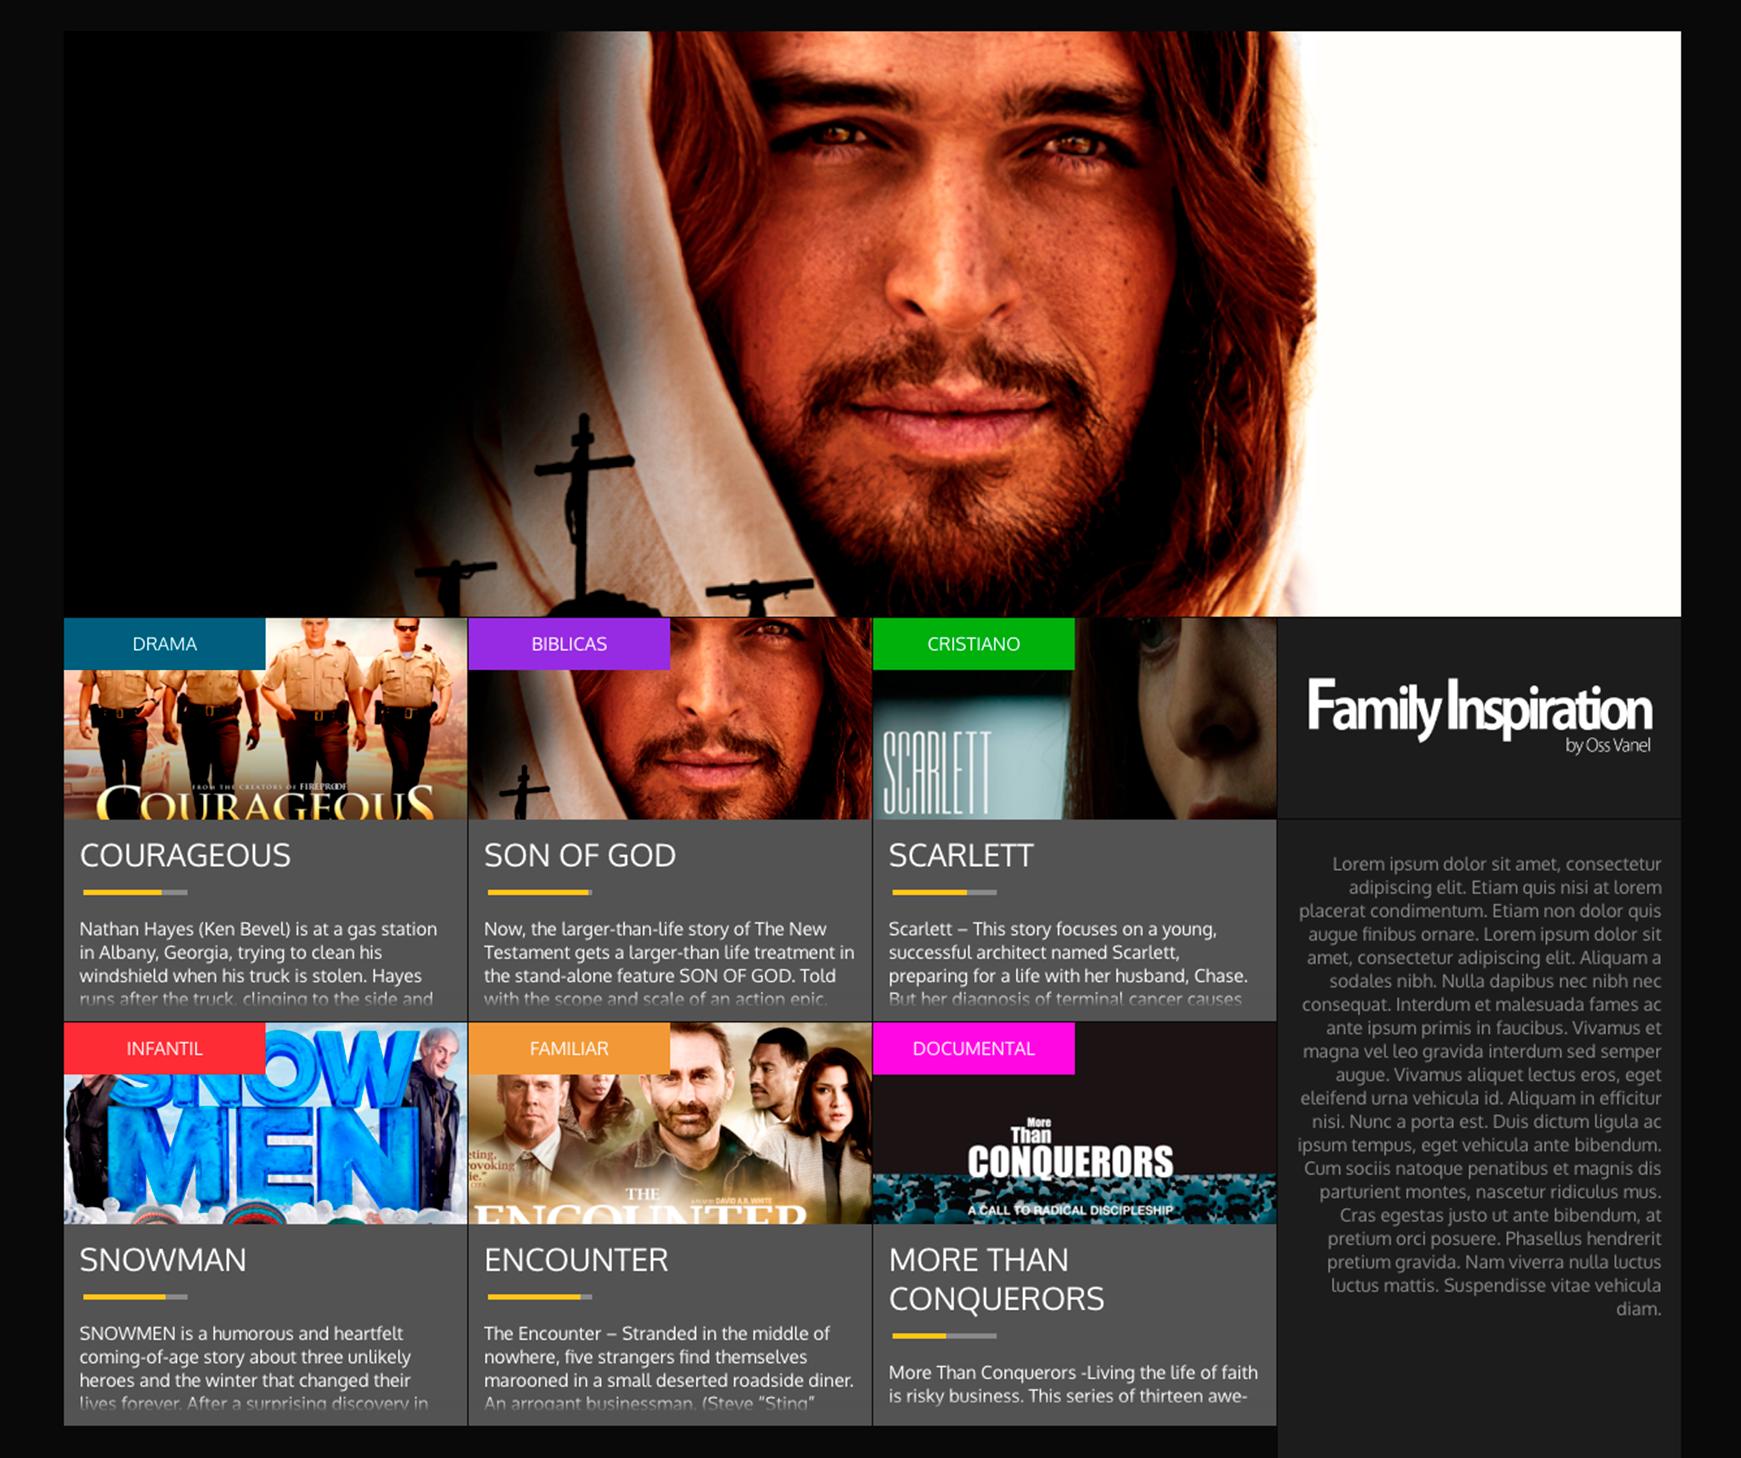 Family Inspiration - Portafolio Audiovisual